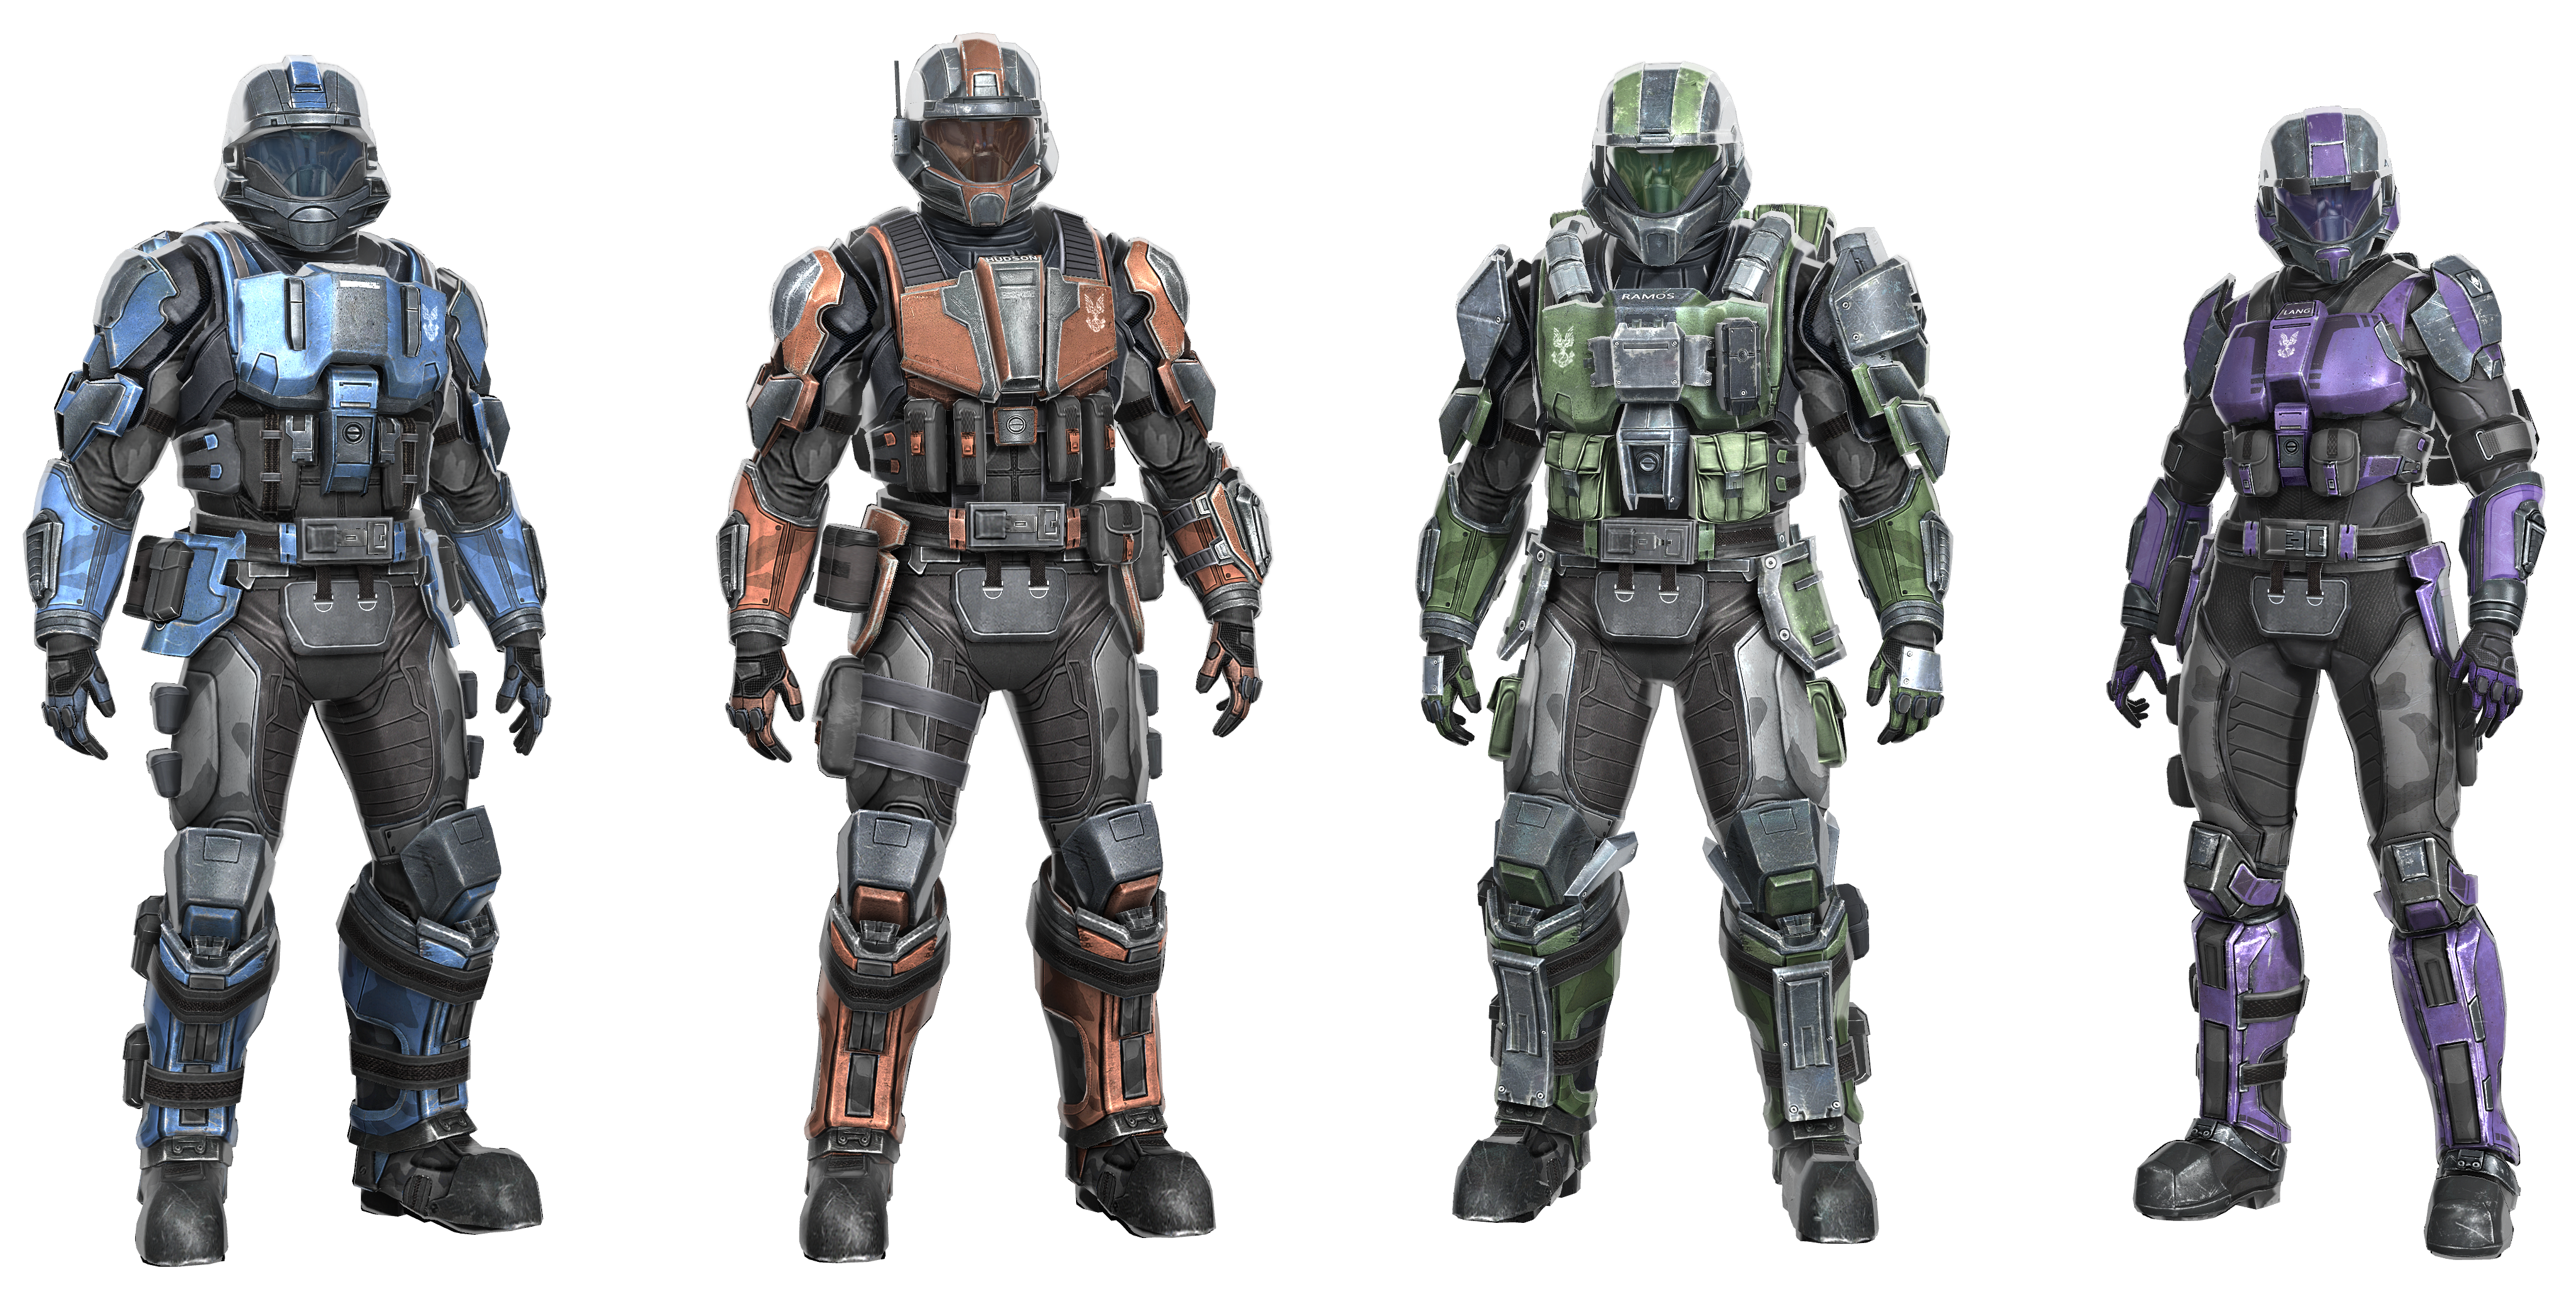 Hfr Fireteamraven Armour Png 4 096 2 092 Pixels Halo Armor Halo Armor Concept